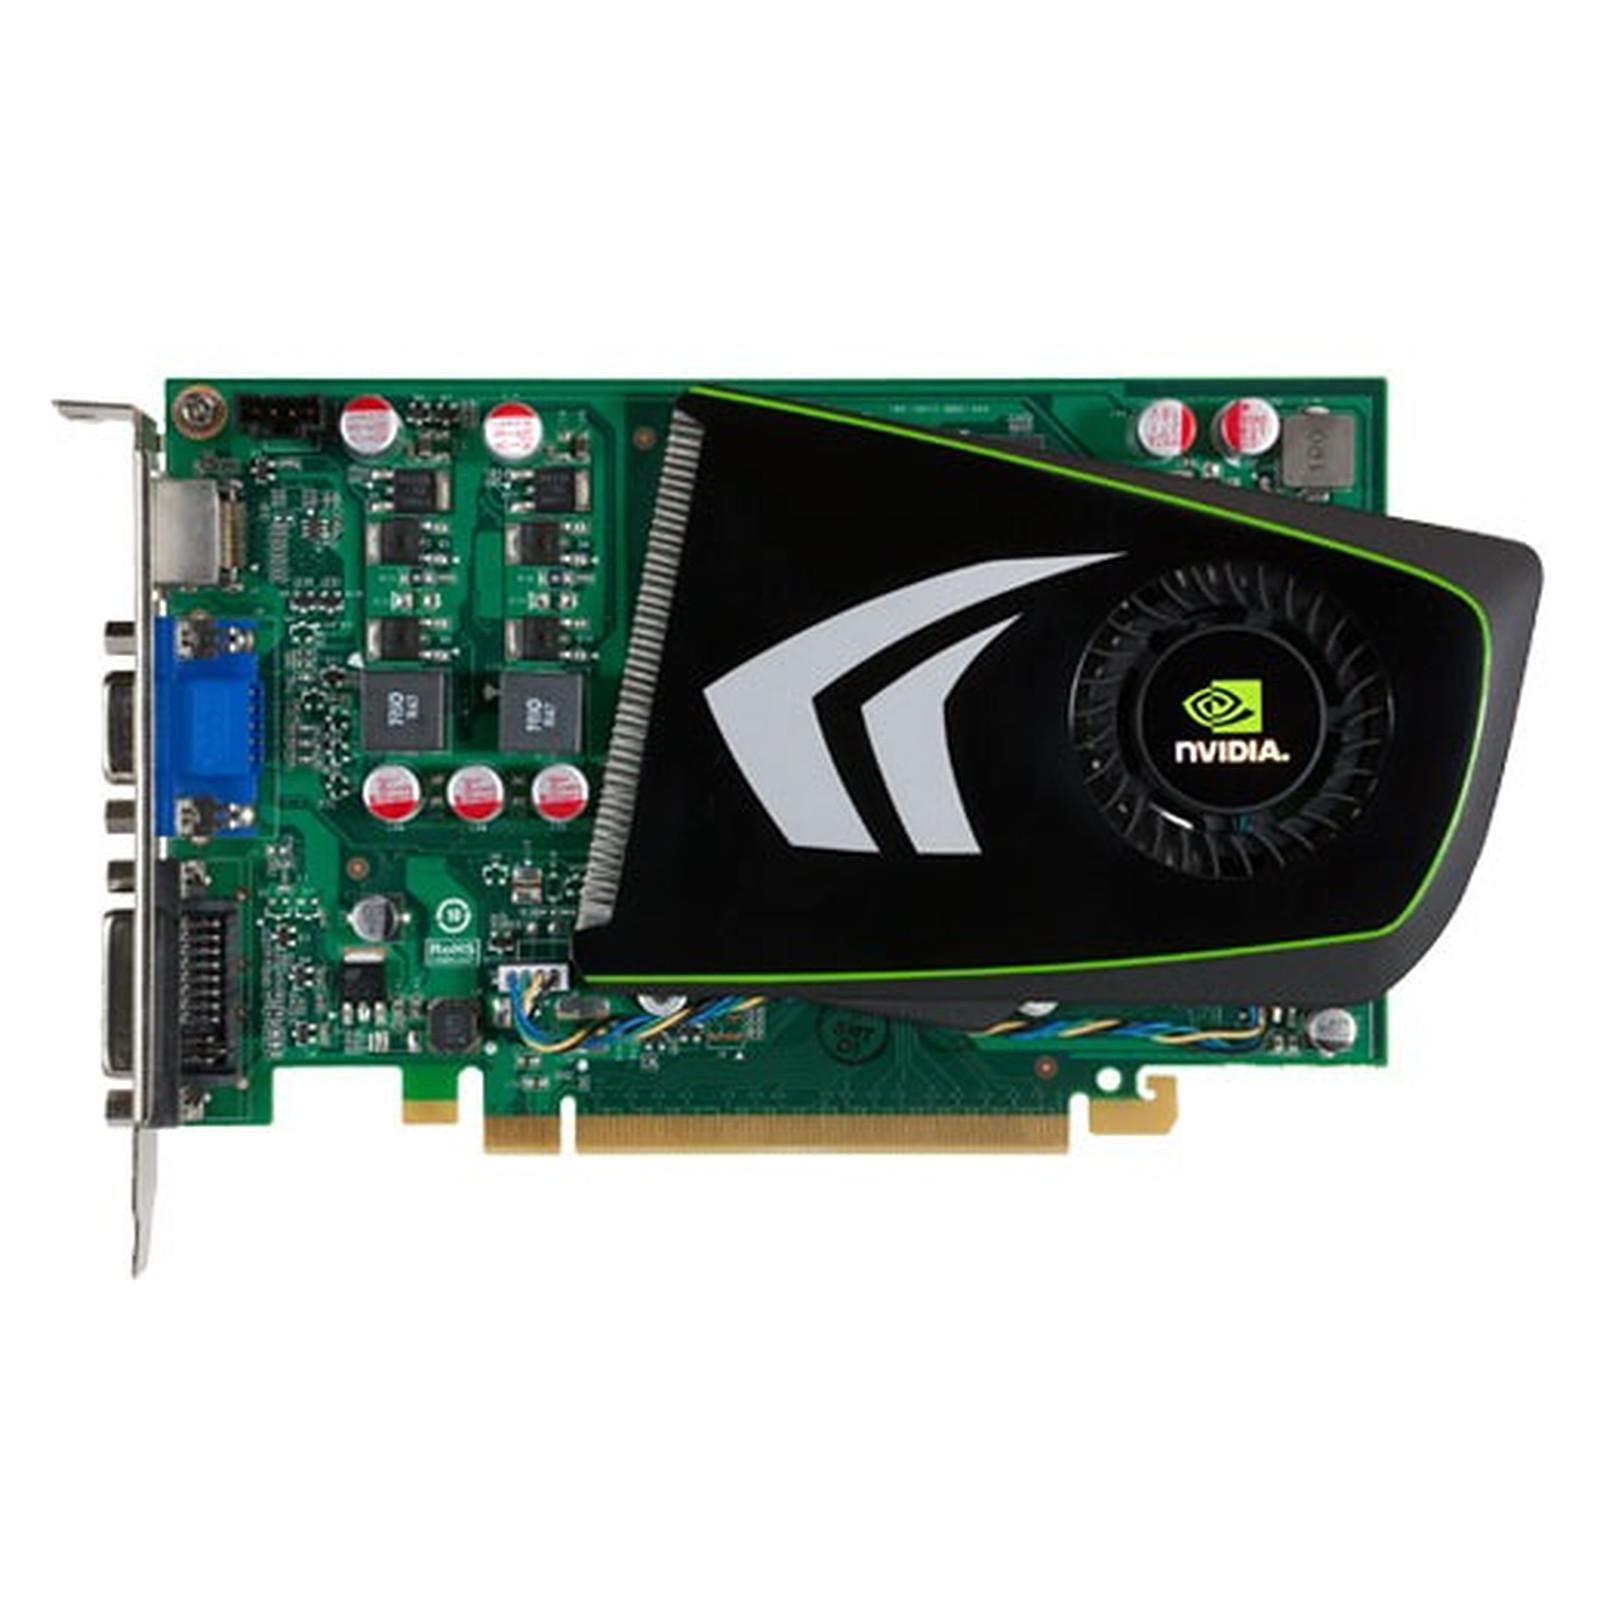 NVIDIA GeForce GT 240 512 Mo